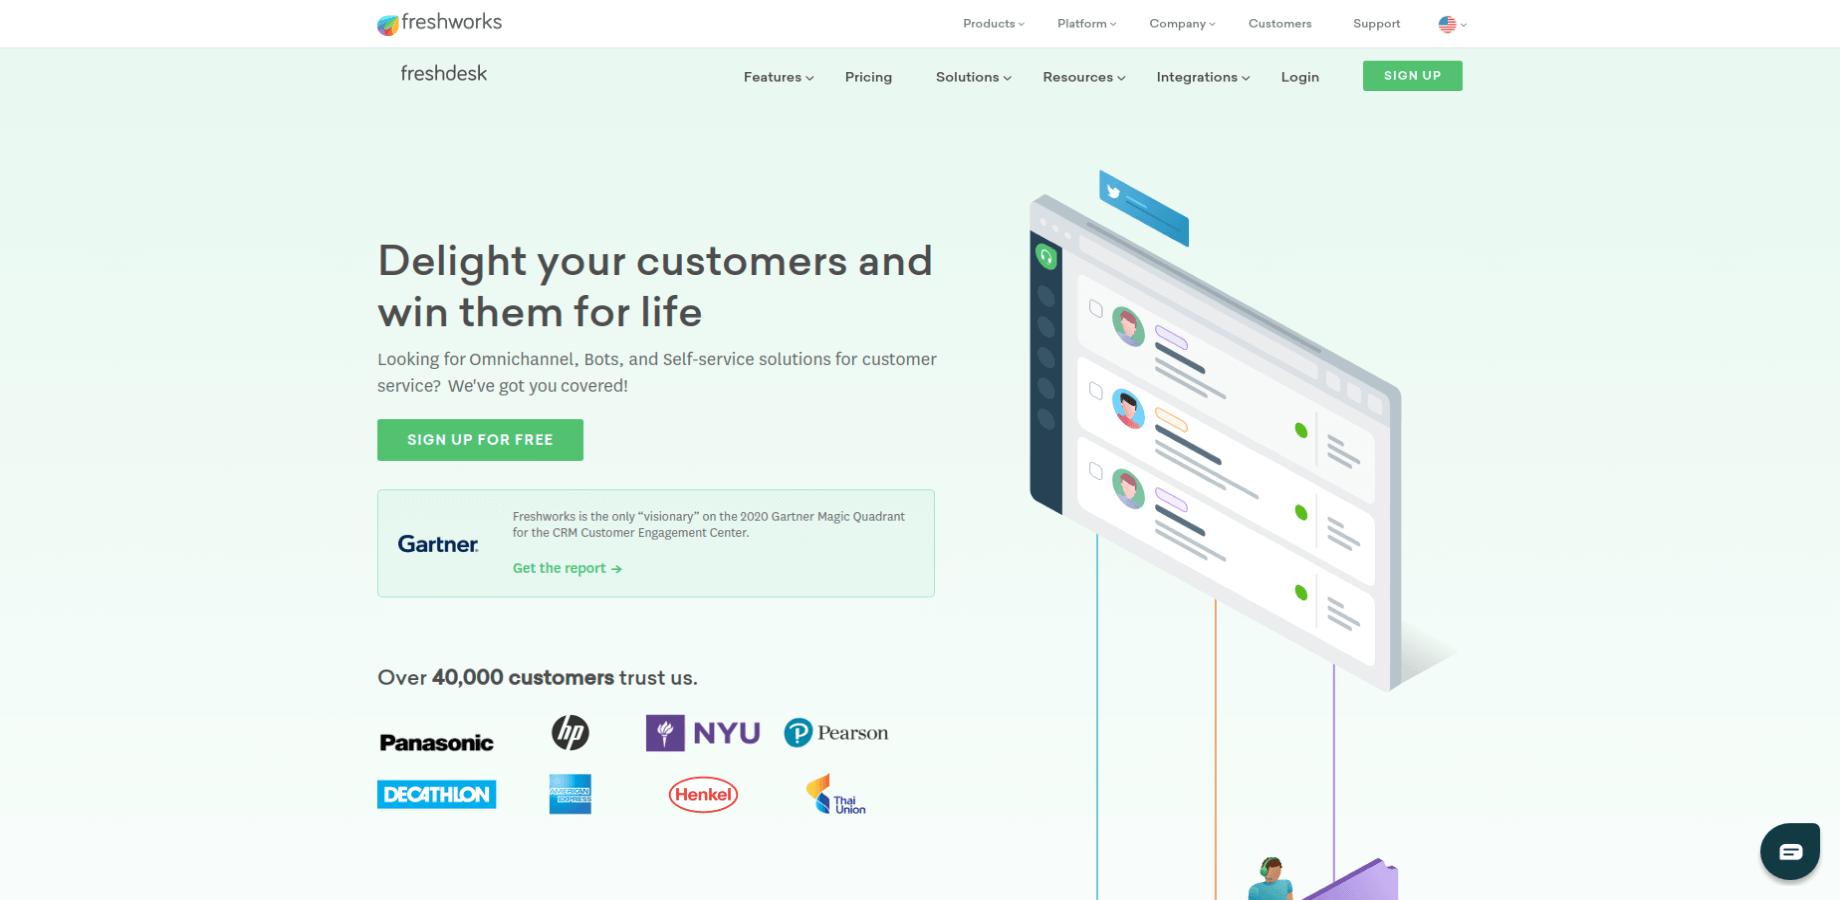 Freshdesk Landing Page Screenshot